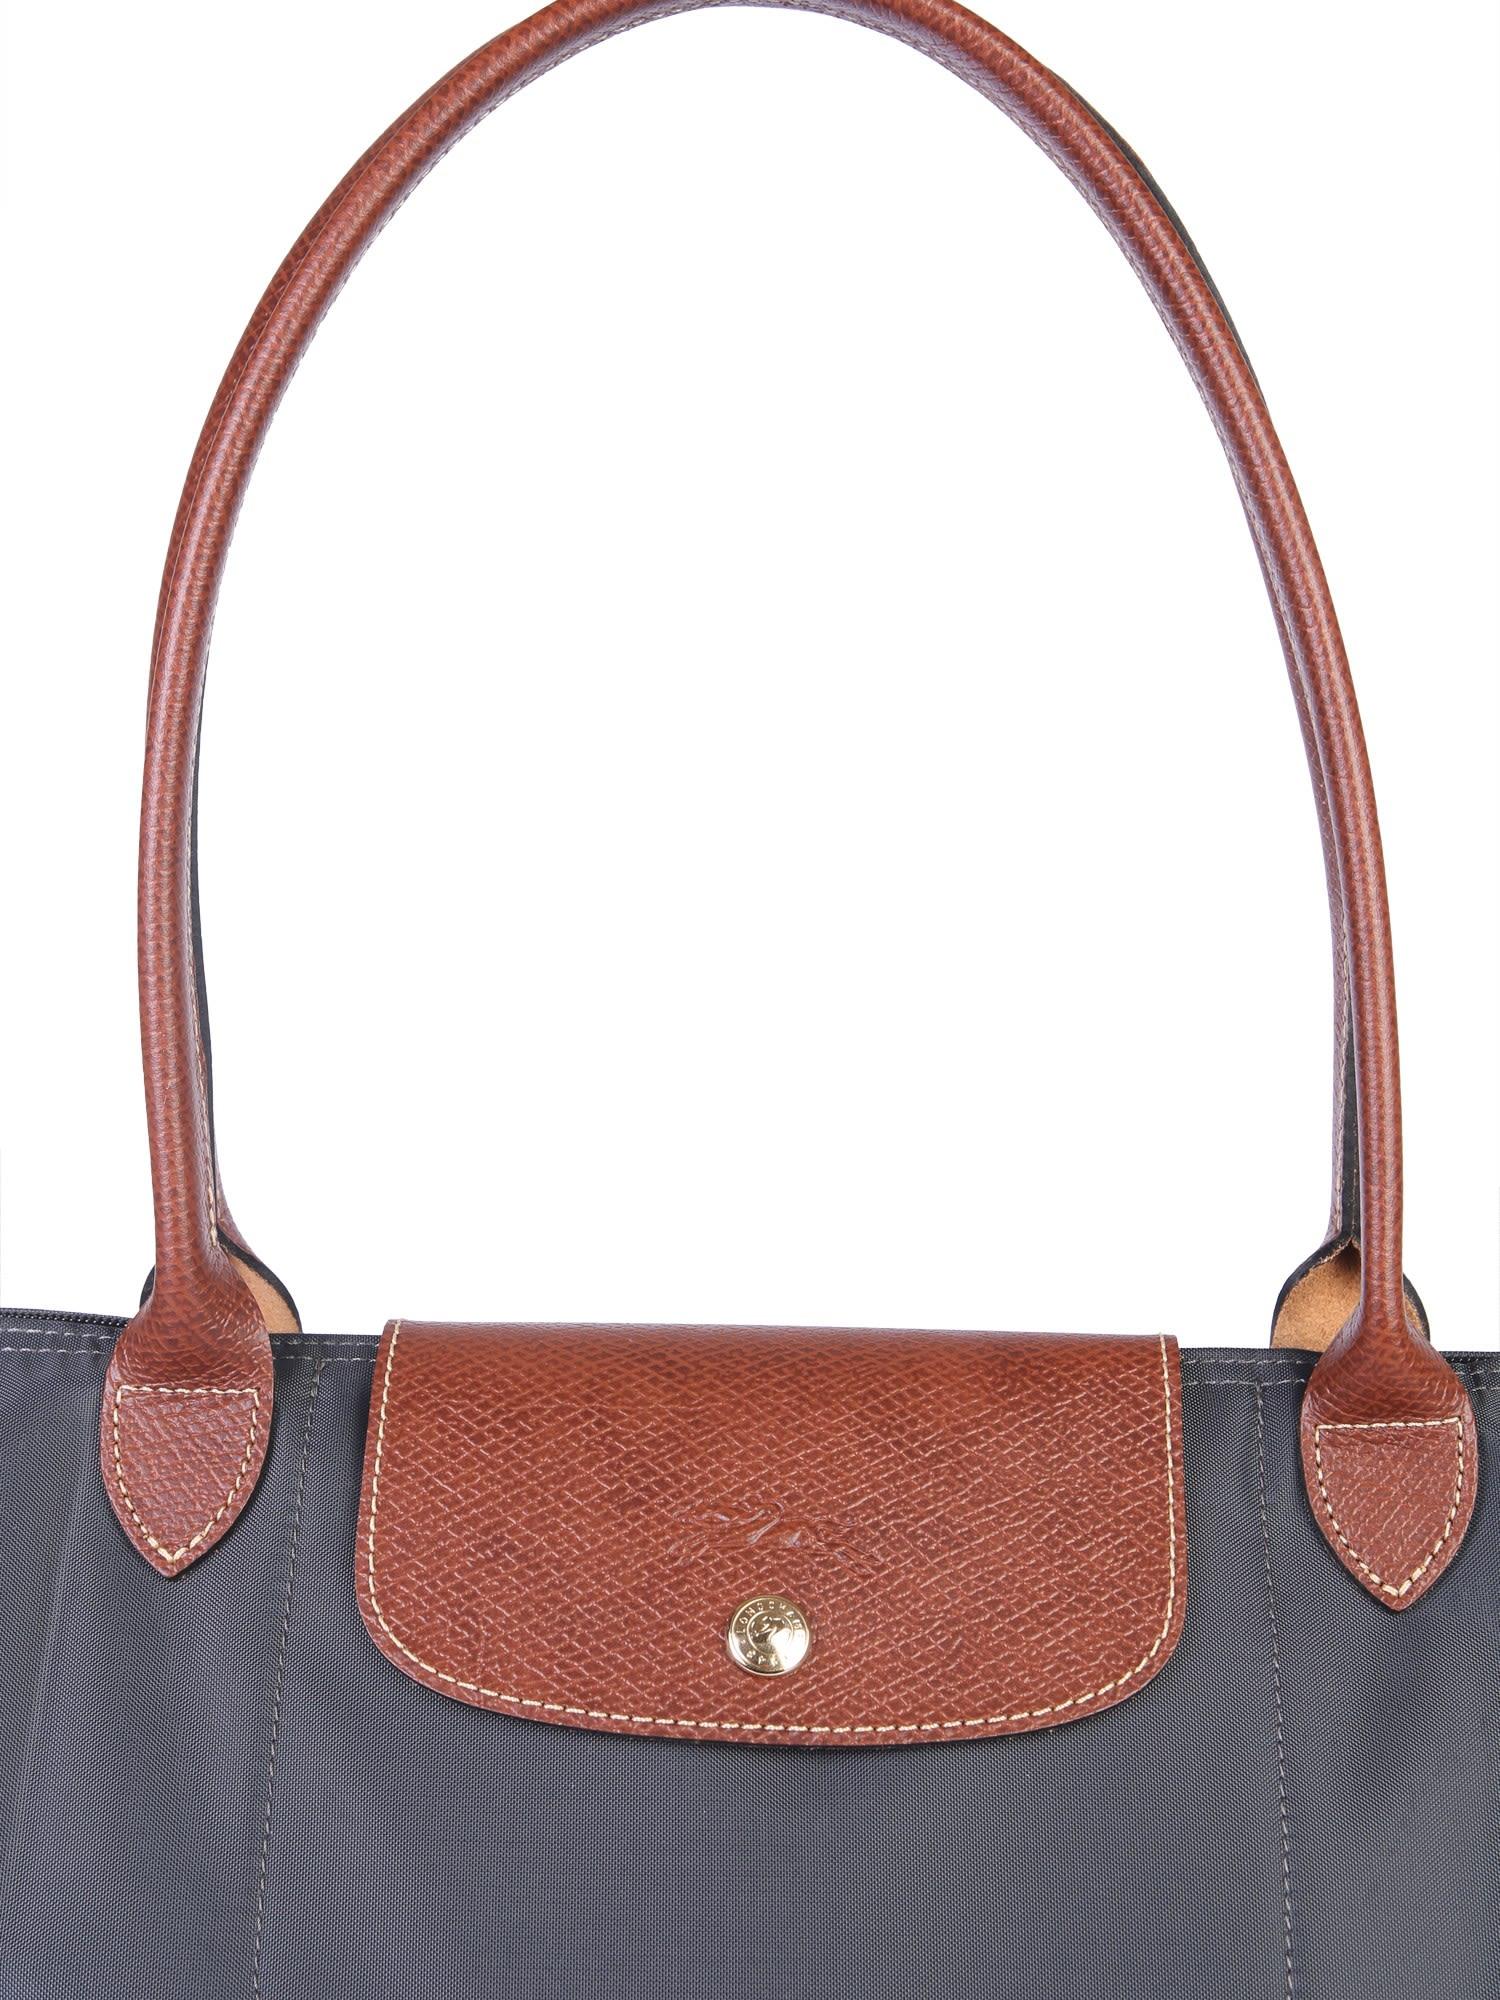 ae2cccd5eb7 Longchamp Longchamp Large Le Pliage Bag - GRIGIO - 10790040 | italist